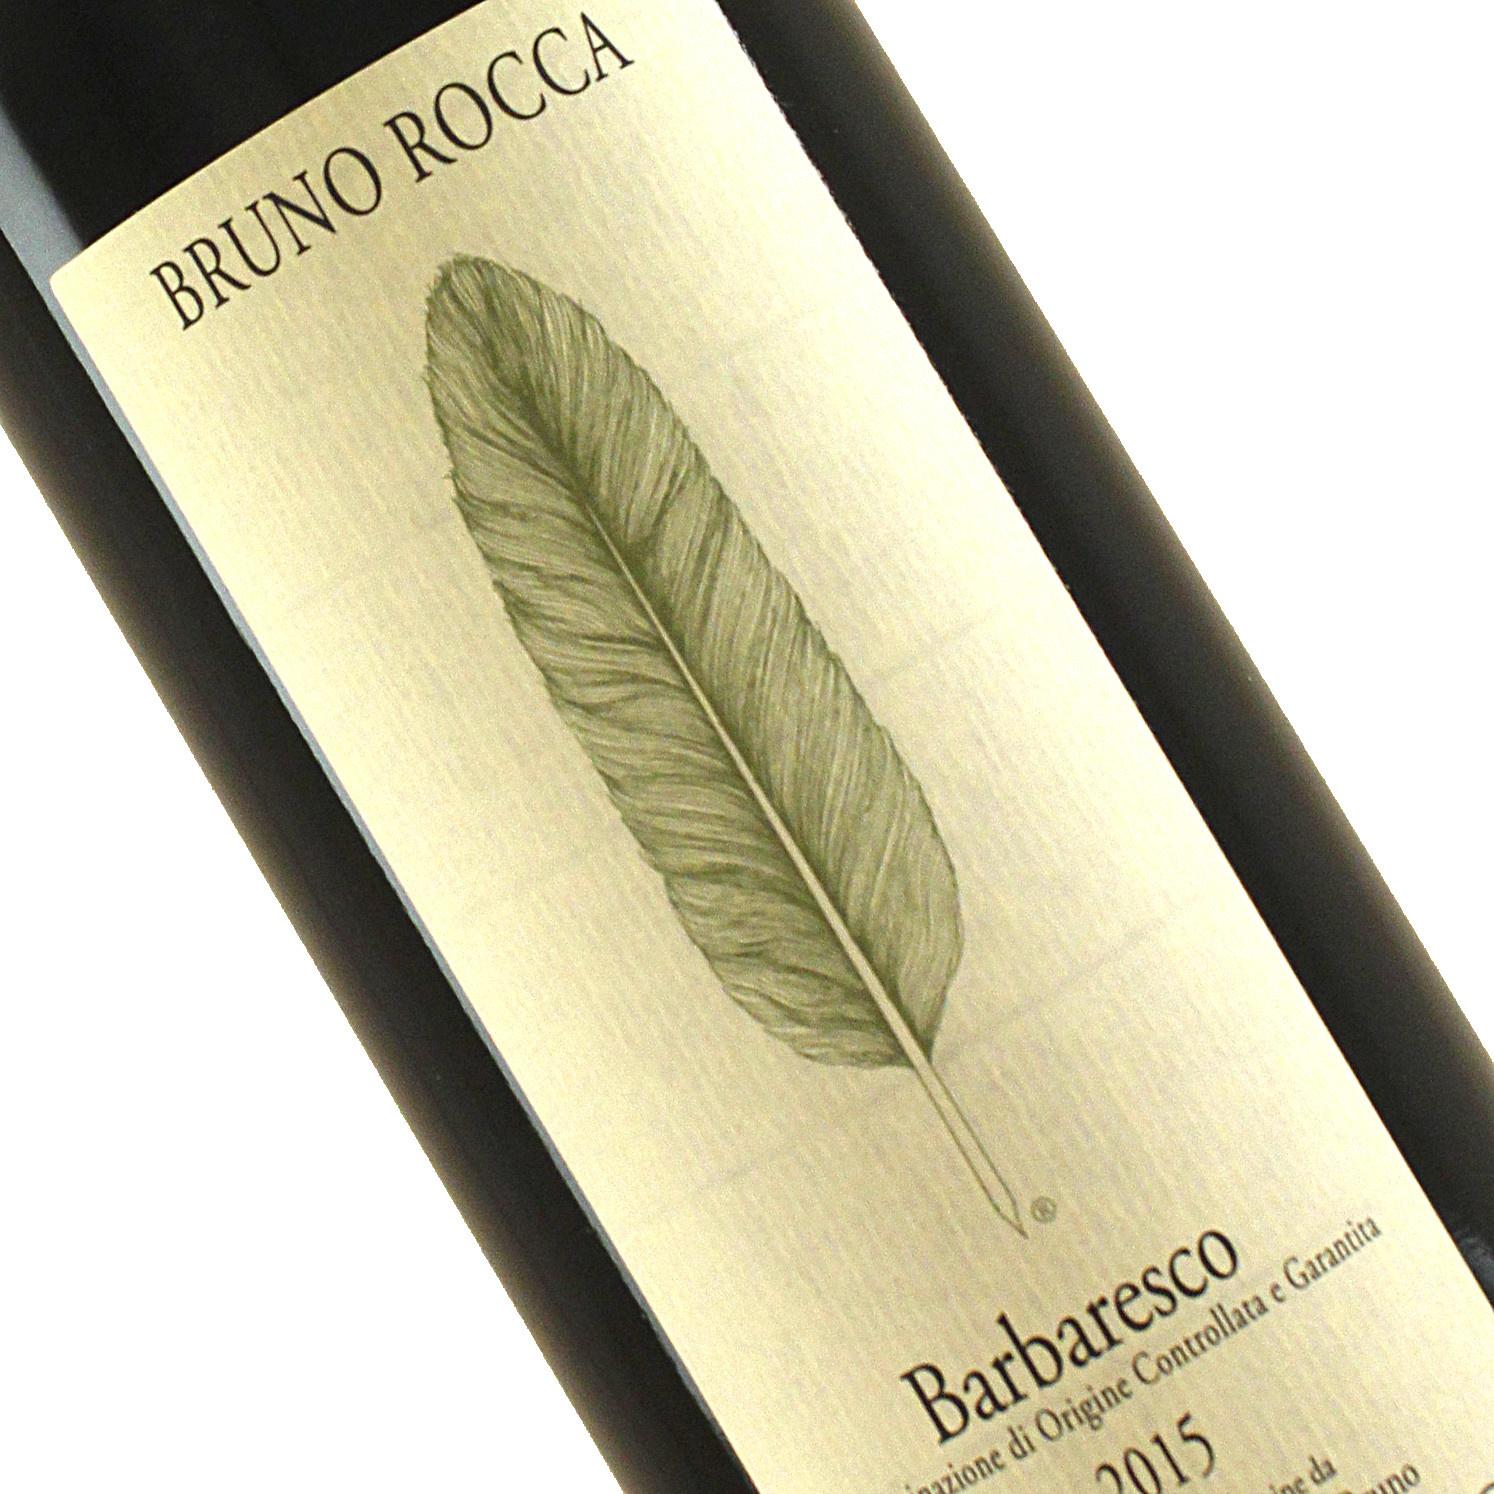 Bruno Rocca 2015 Barbaresco, Piedmont